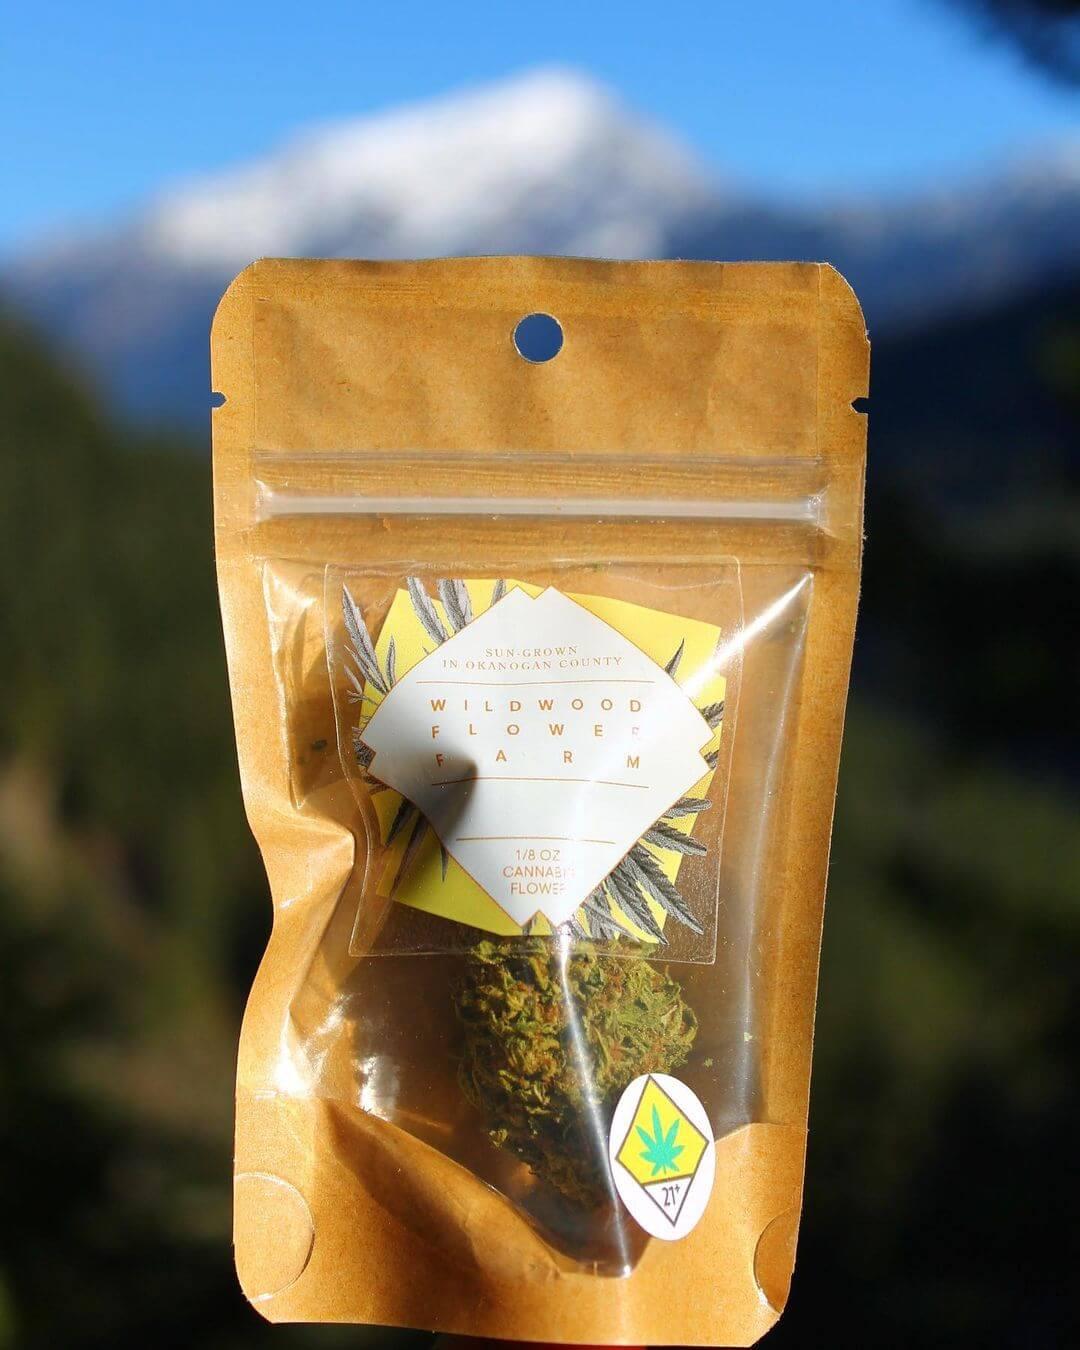 Wildwood Flower Farm cannabis bud